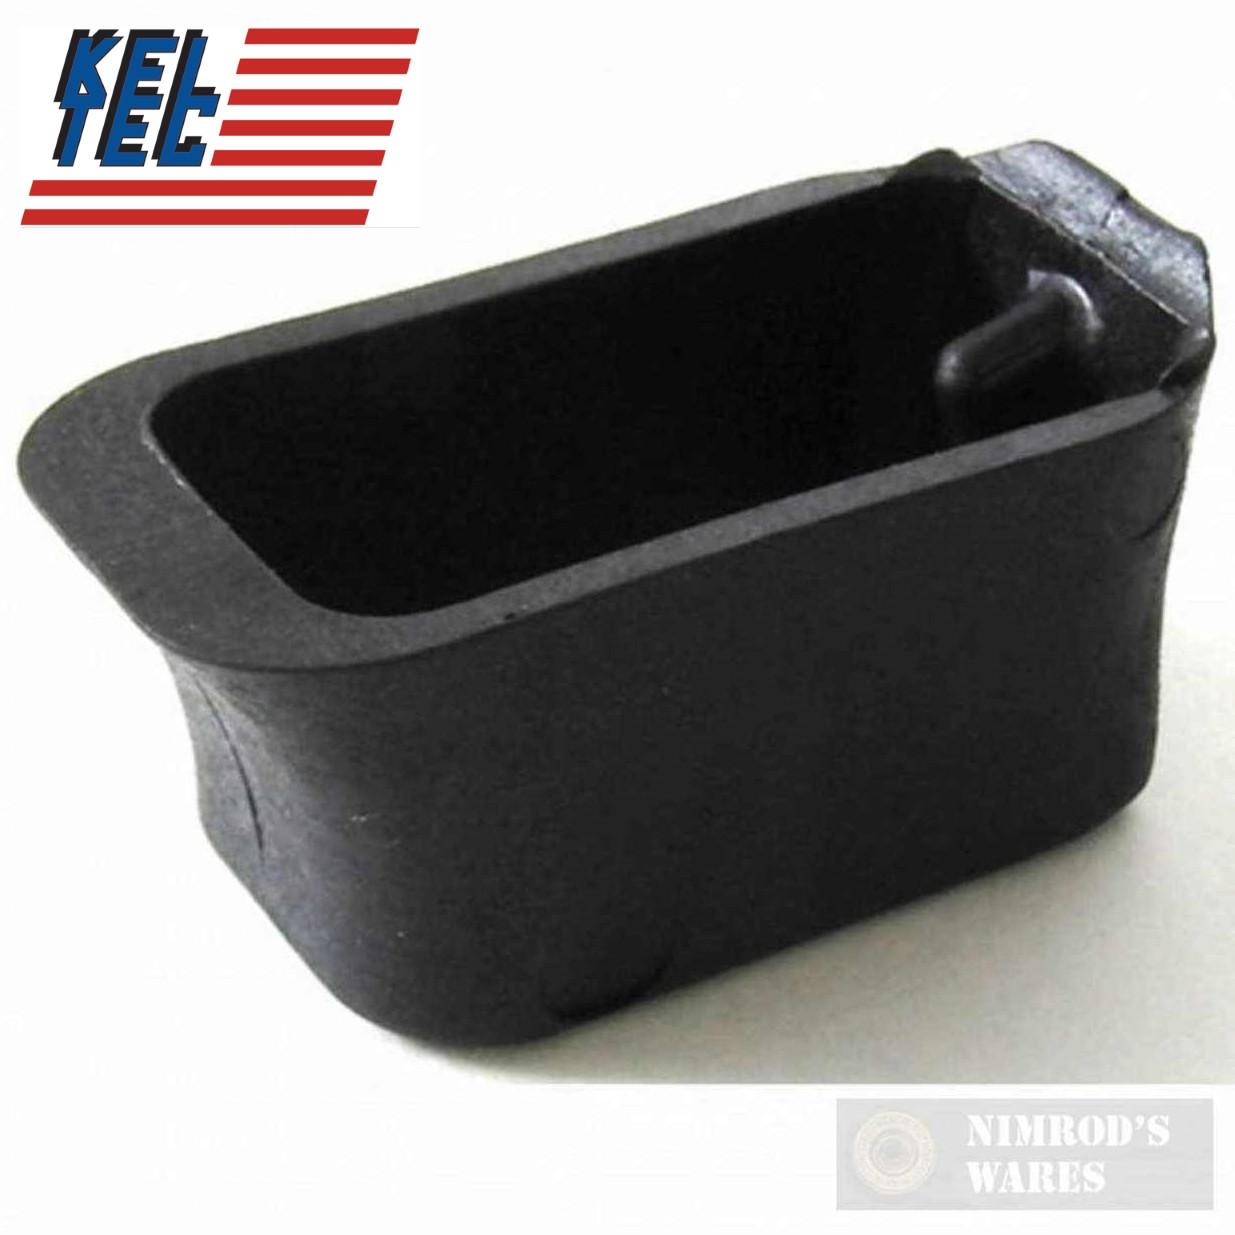 Kel-Tec Grip Sleeve Use S&W59 High-Cap Magazine in P11 P-043